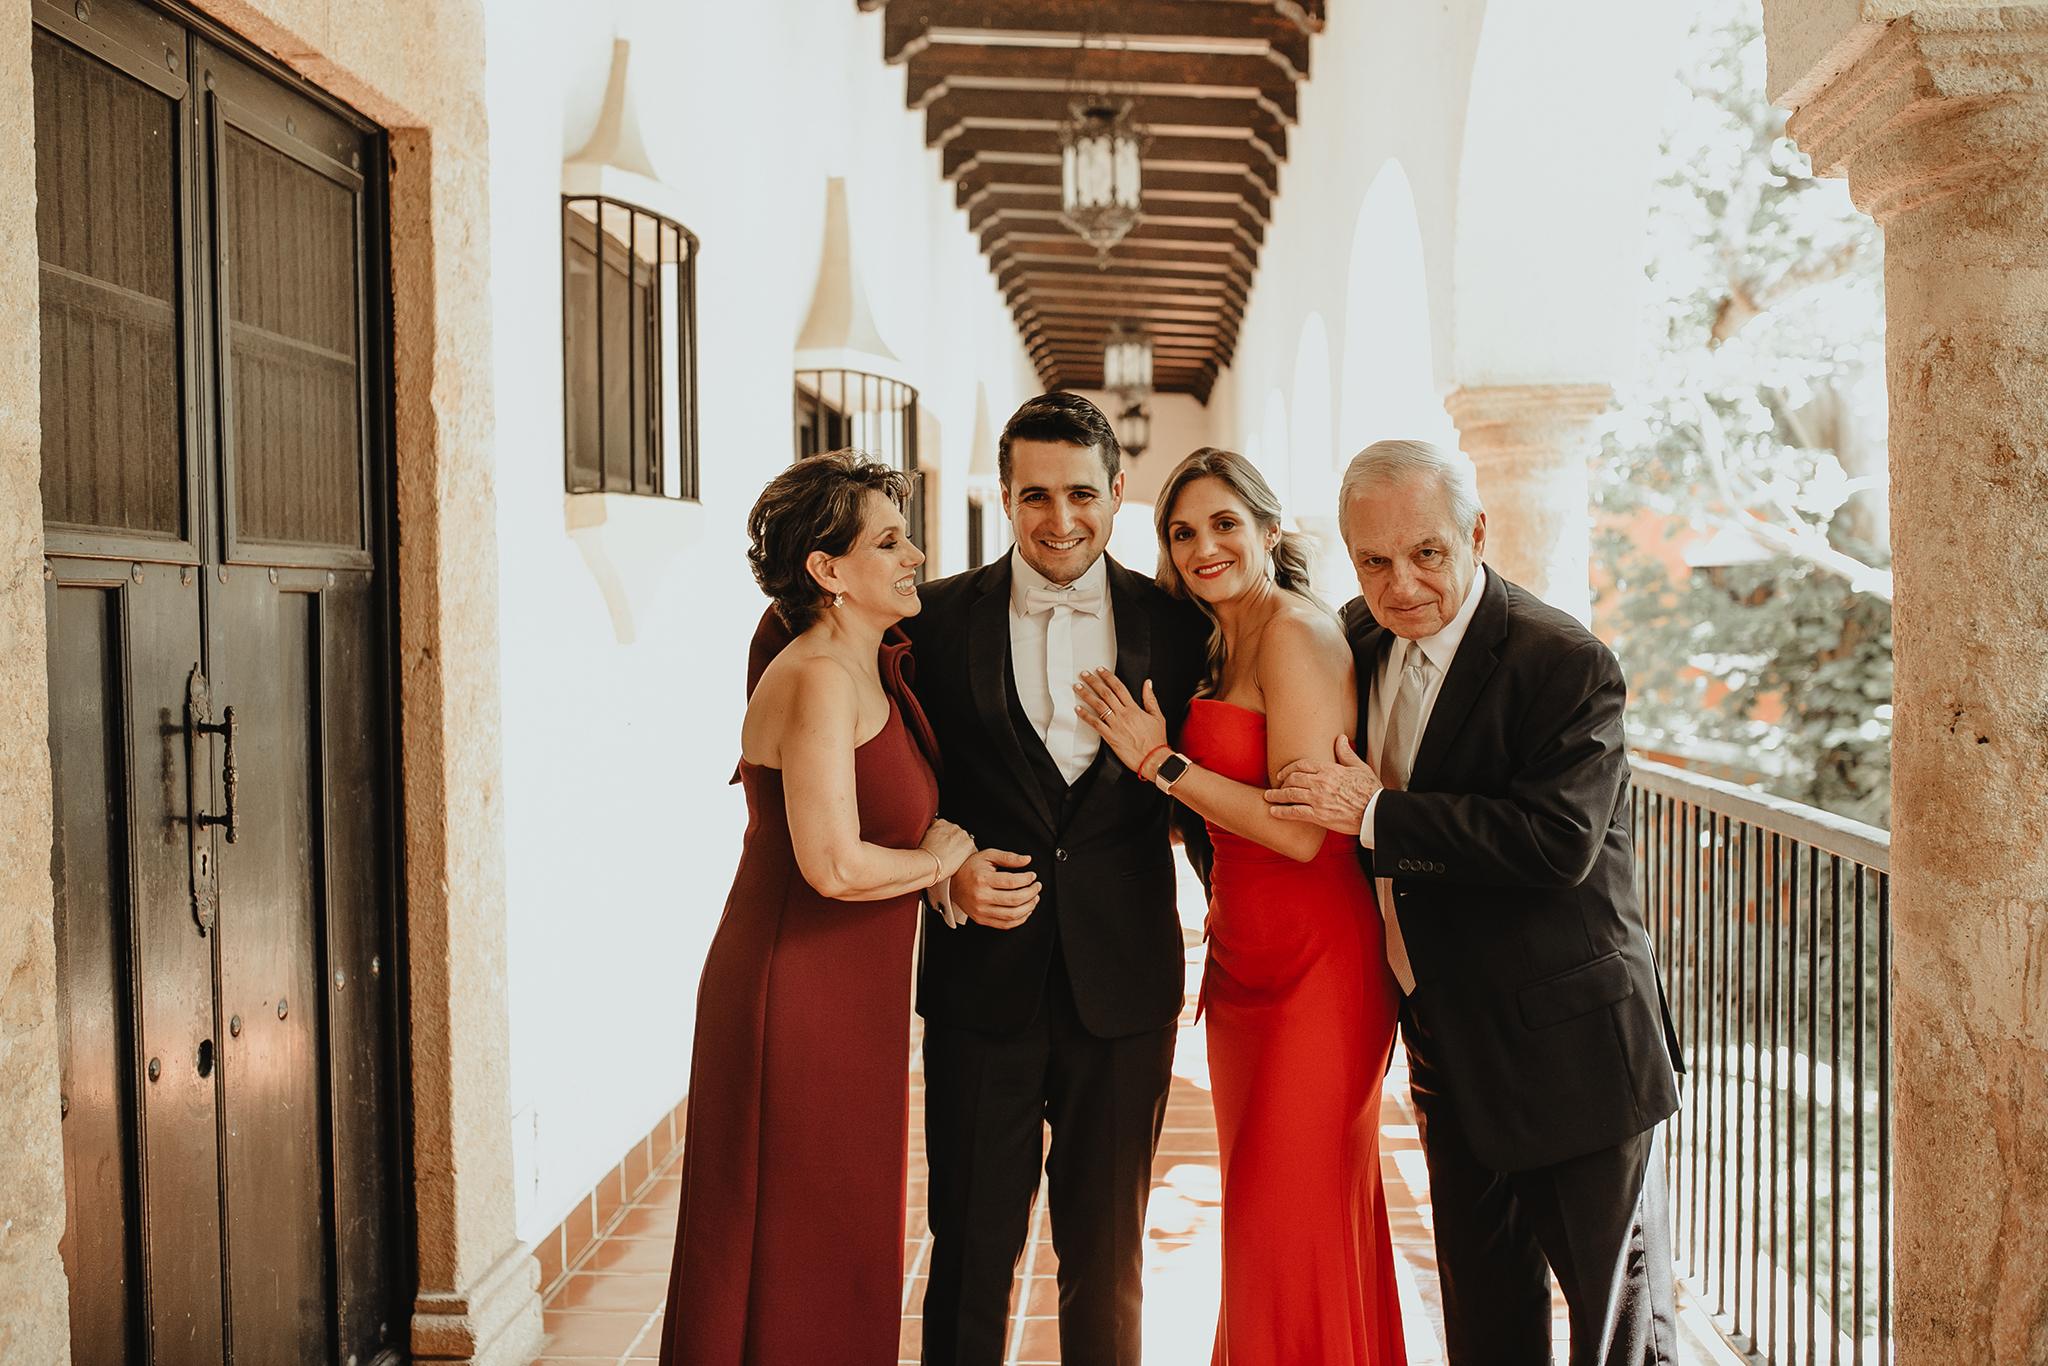 0238R&F__WeddingDestination_Weddingmerida_BodaMexico_FotografoDeBodas_FabrizioSimoneenFotografo.jpg